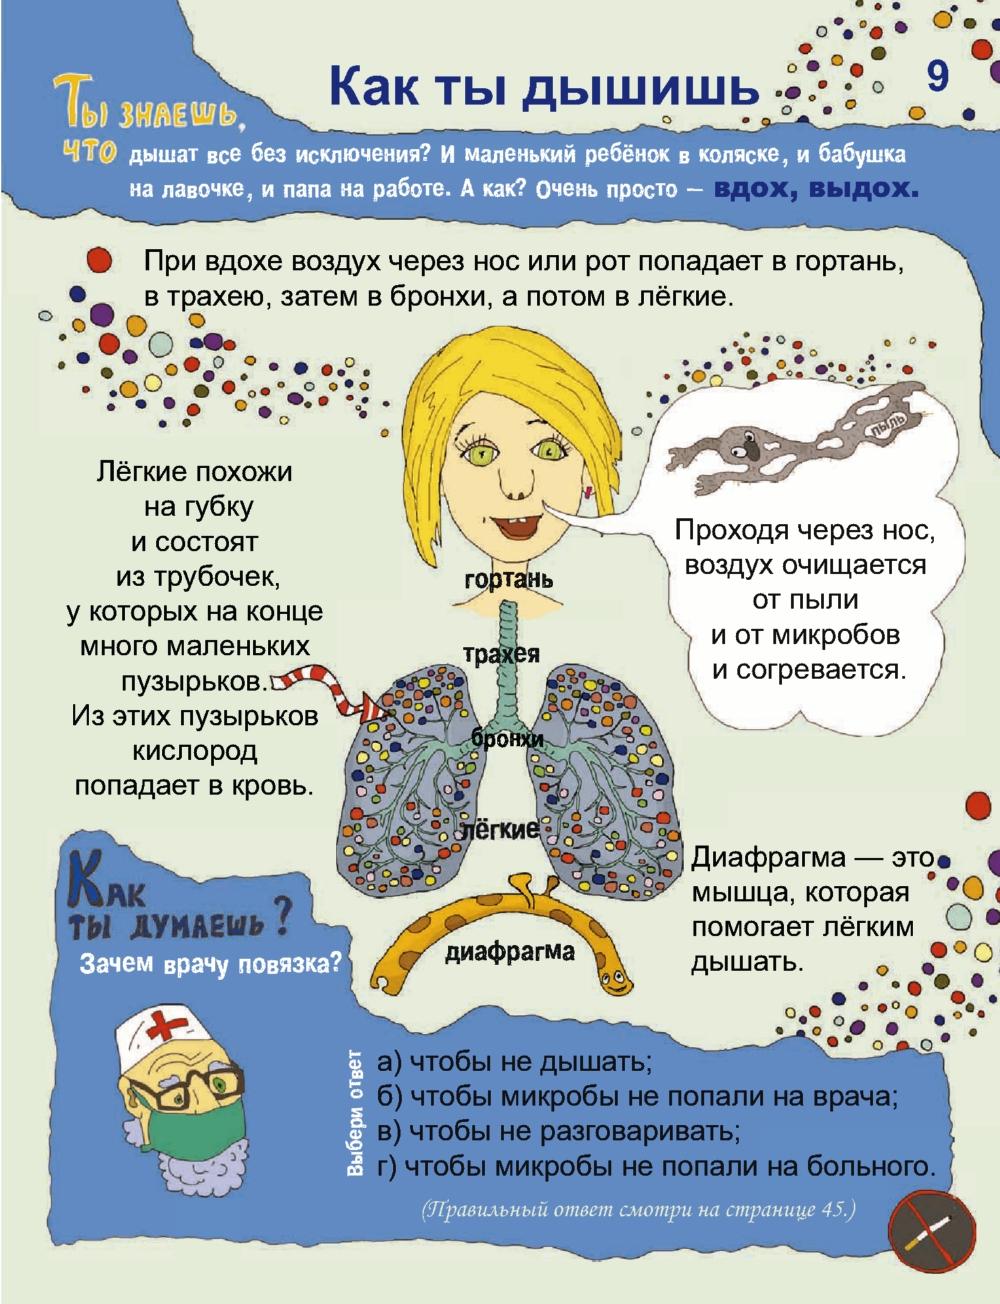 http://i1.imageban.ru/out/2013/12/09/0e3d10b4f70b6bb80ef6b868c439afe8.jpg